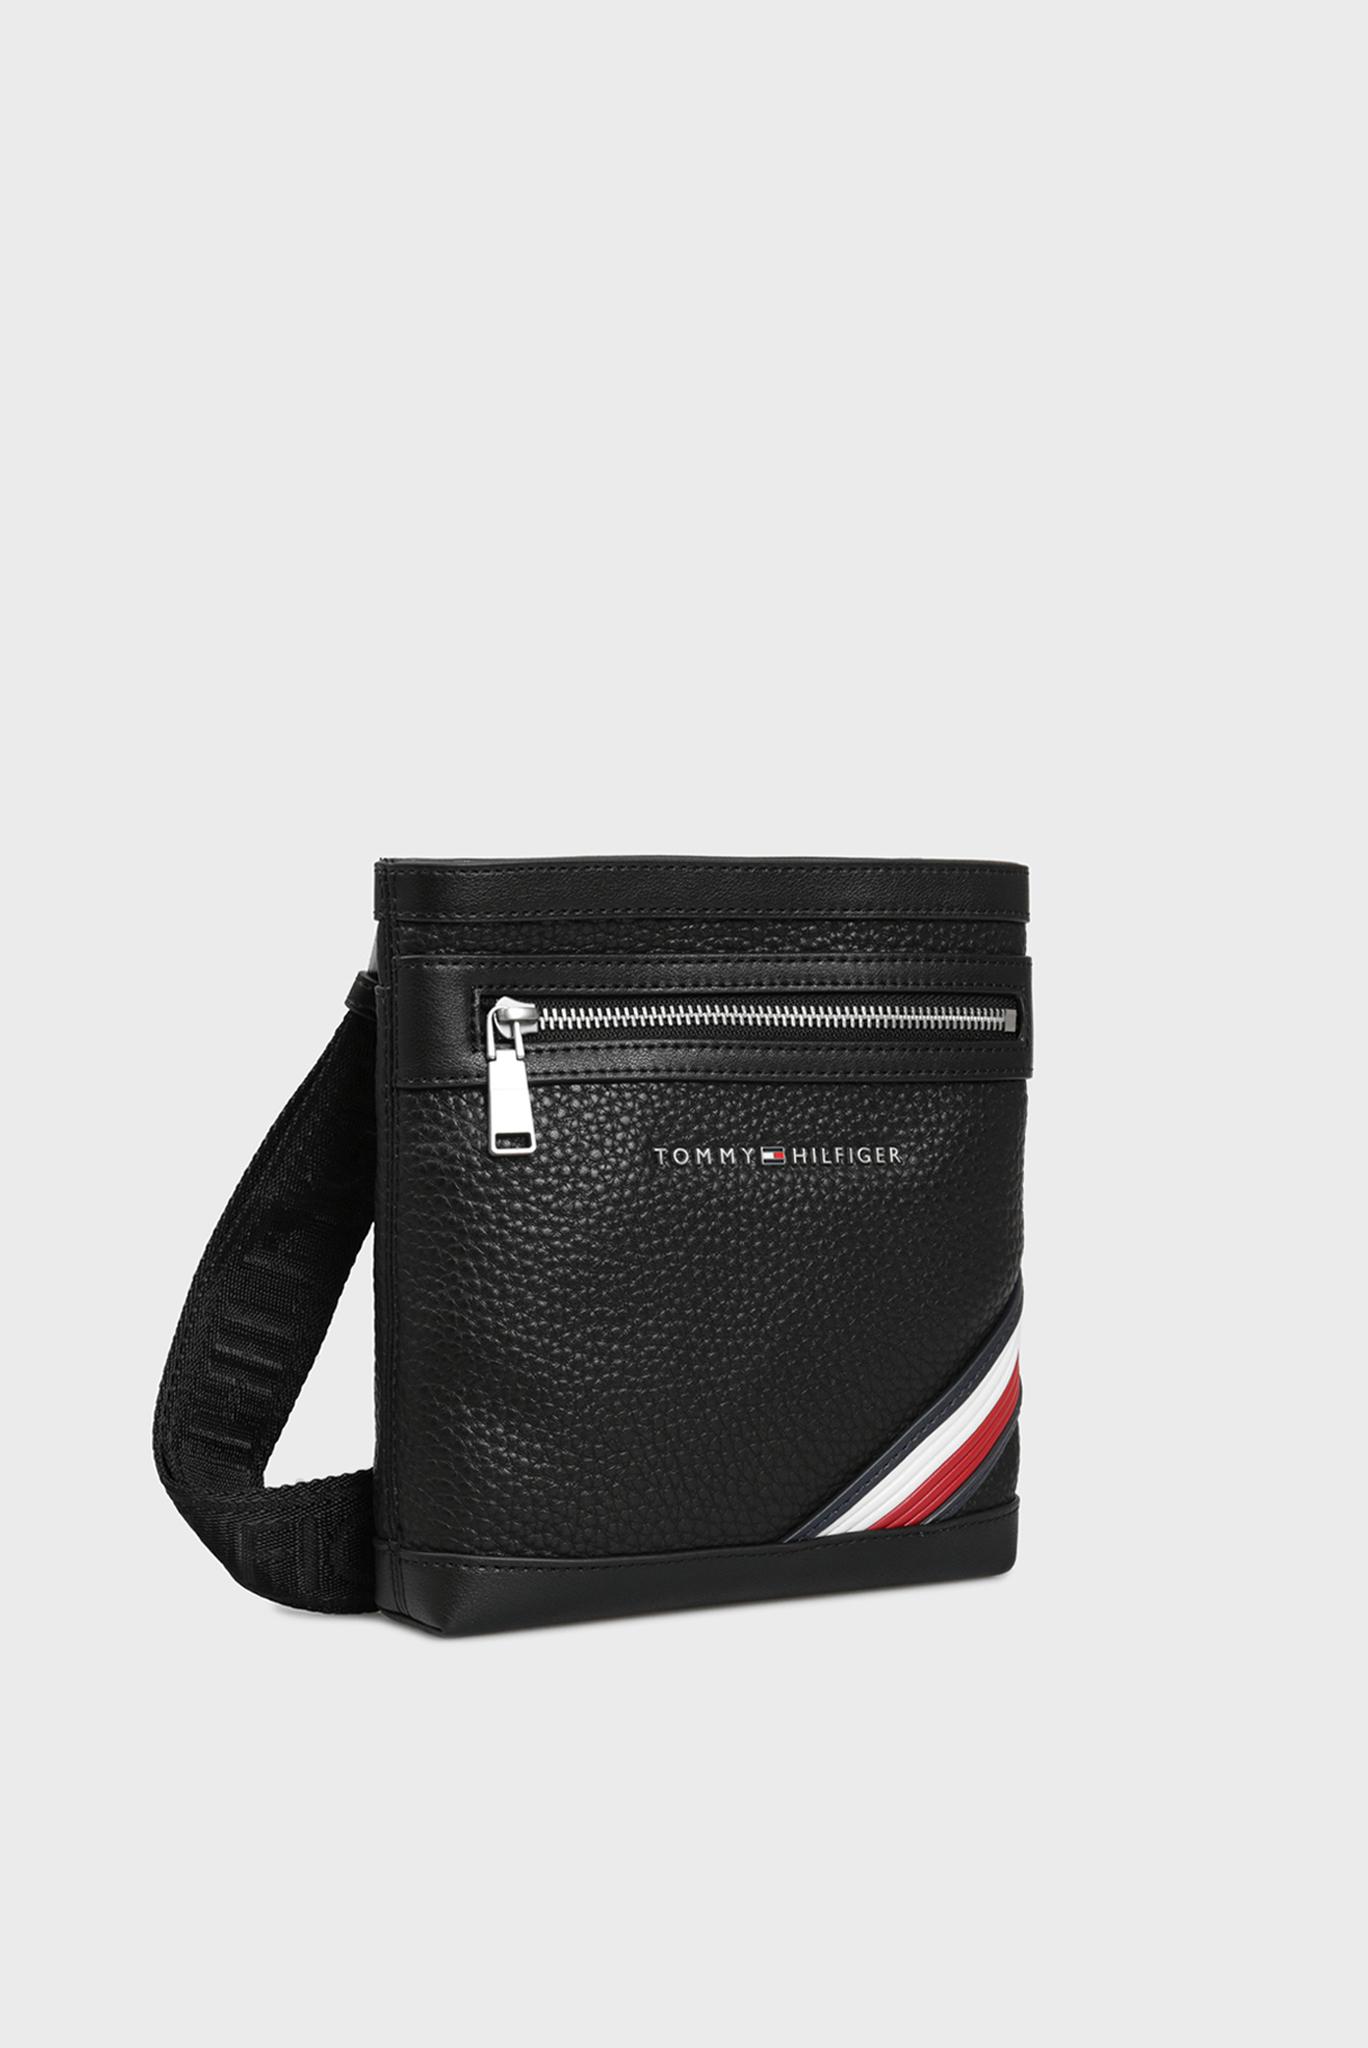 Мужская черная сумка через плечо DOWNTOWN Tommy Hilfiger